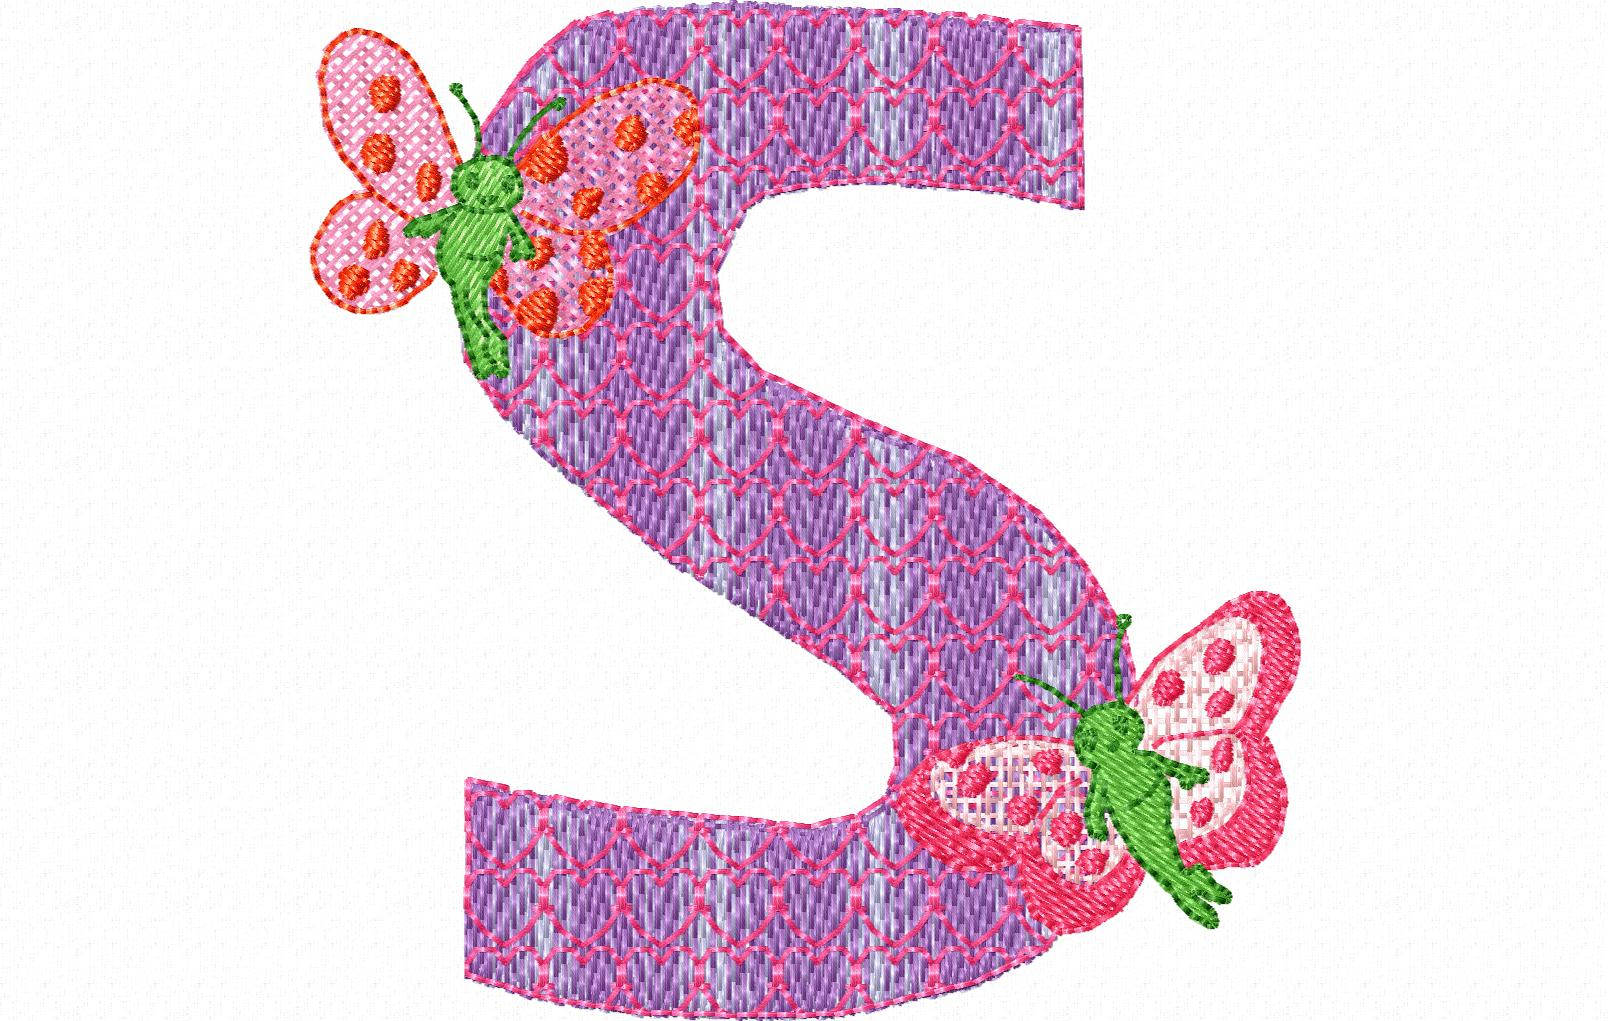 Lilli fee letter s 90 x 92 altavistaventures Choice Image